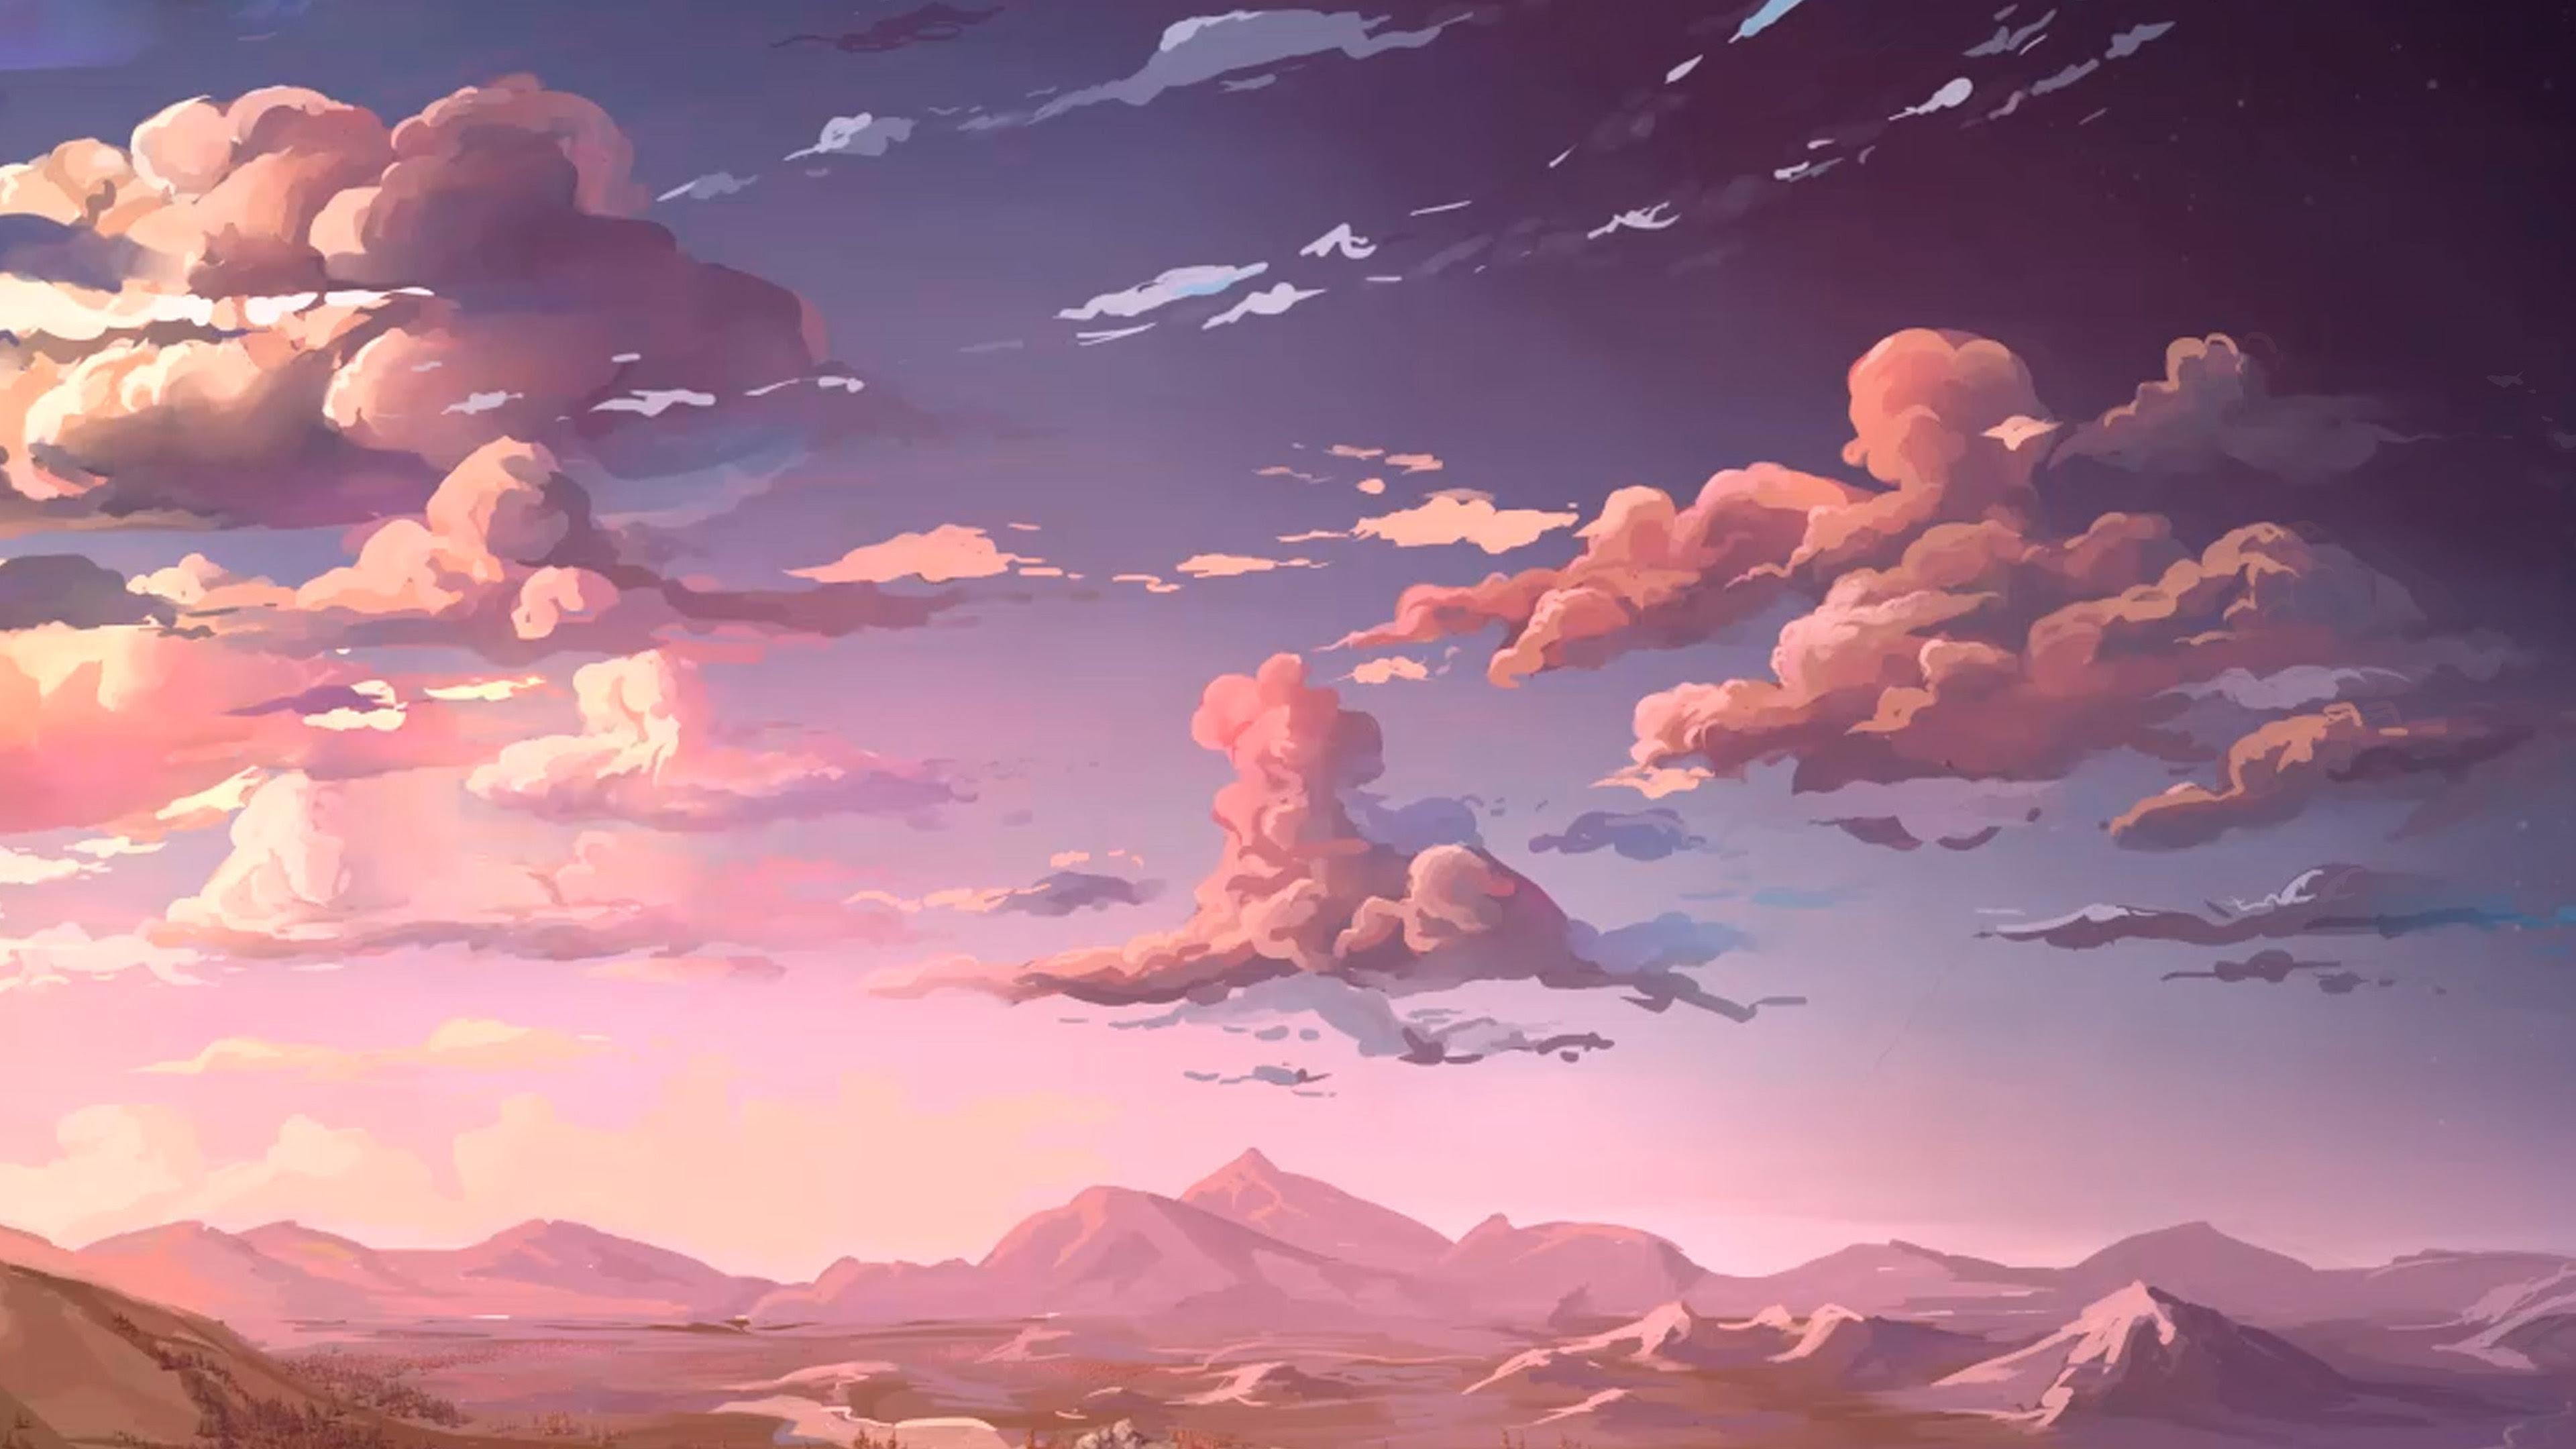 Materi Pelajaran 8 Anime Landscape Wallpaper 4k